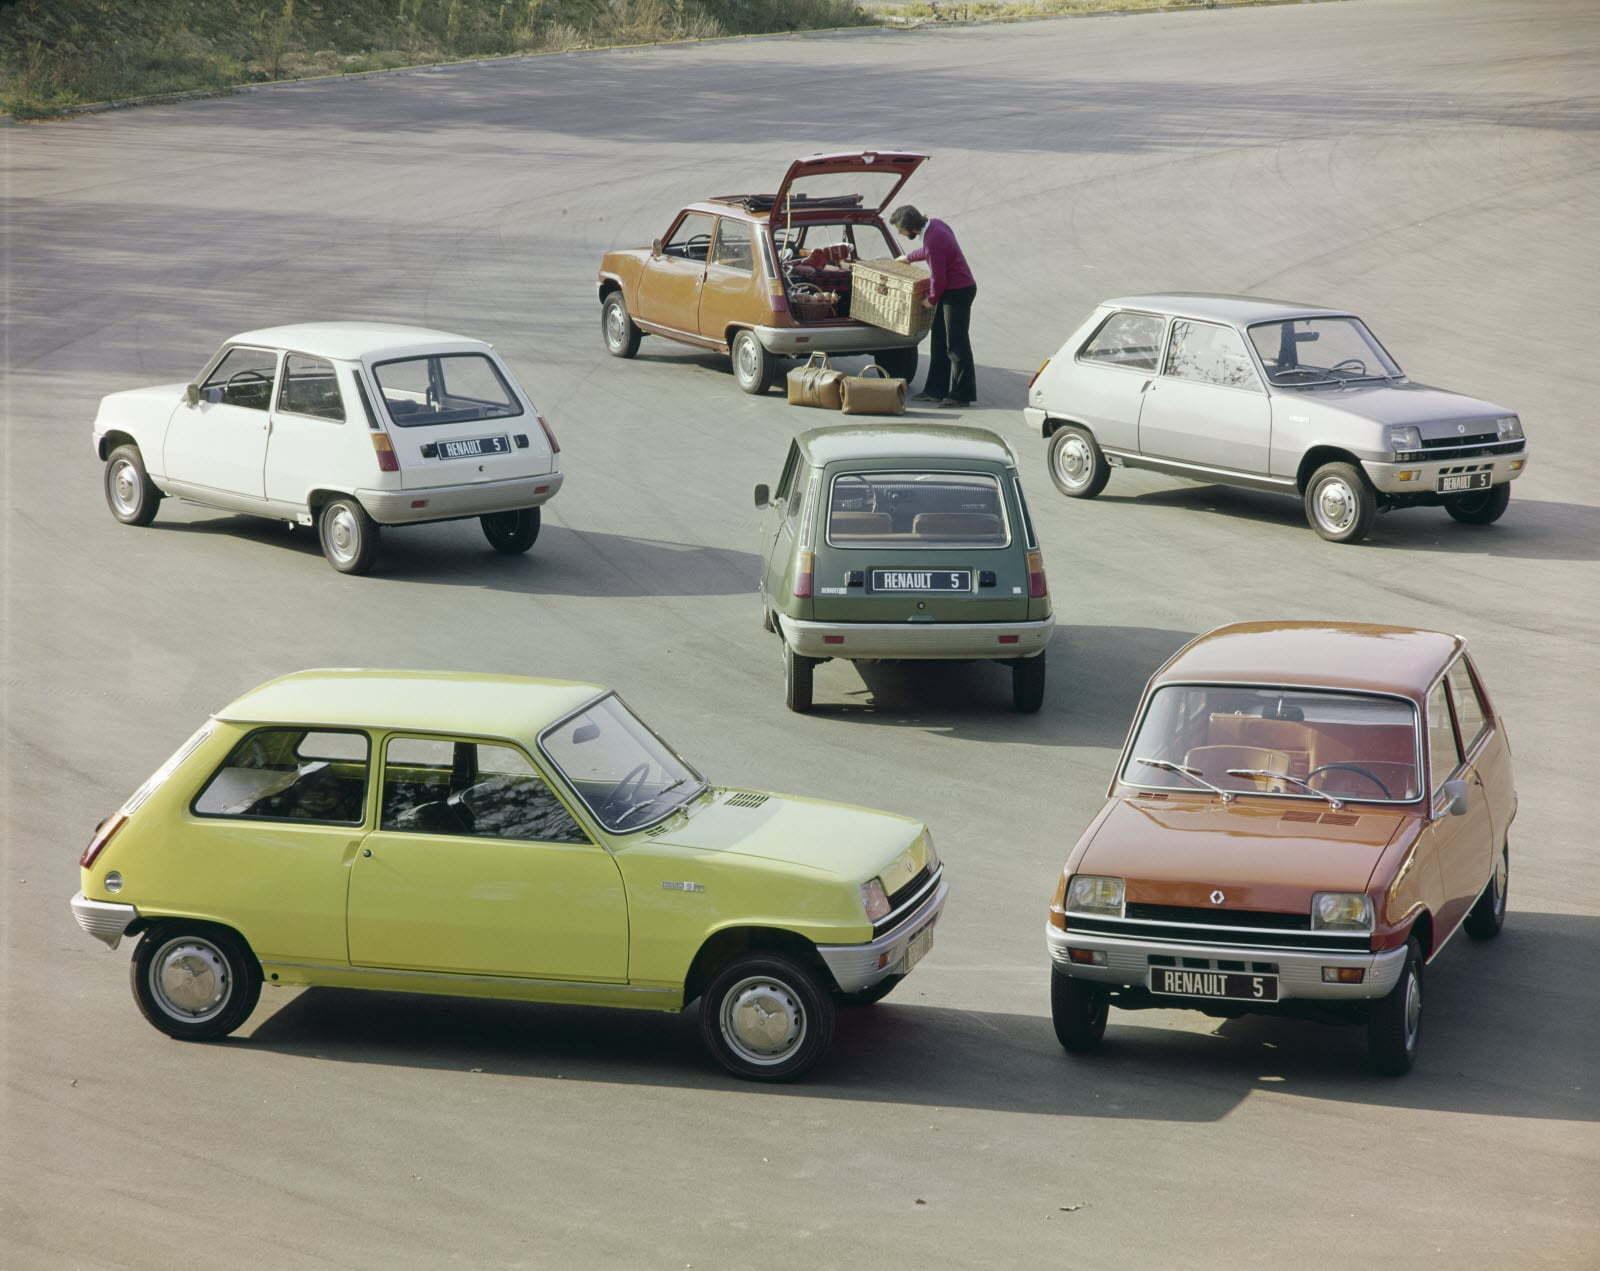 86F4F0B8 6B29 43D0 BBED 17ED93B48C0F | La Renault 5 Alpine : j'irai cracher sur vos GTI.